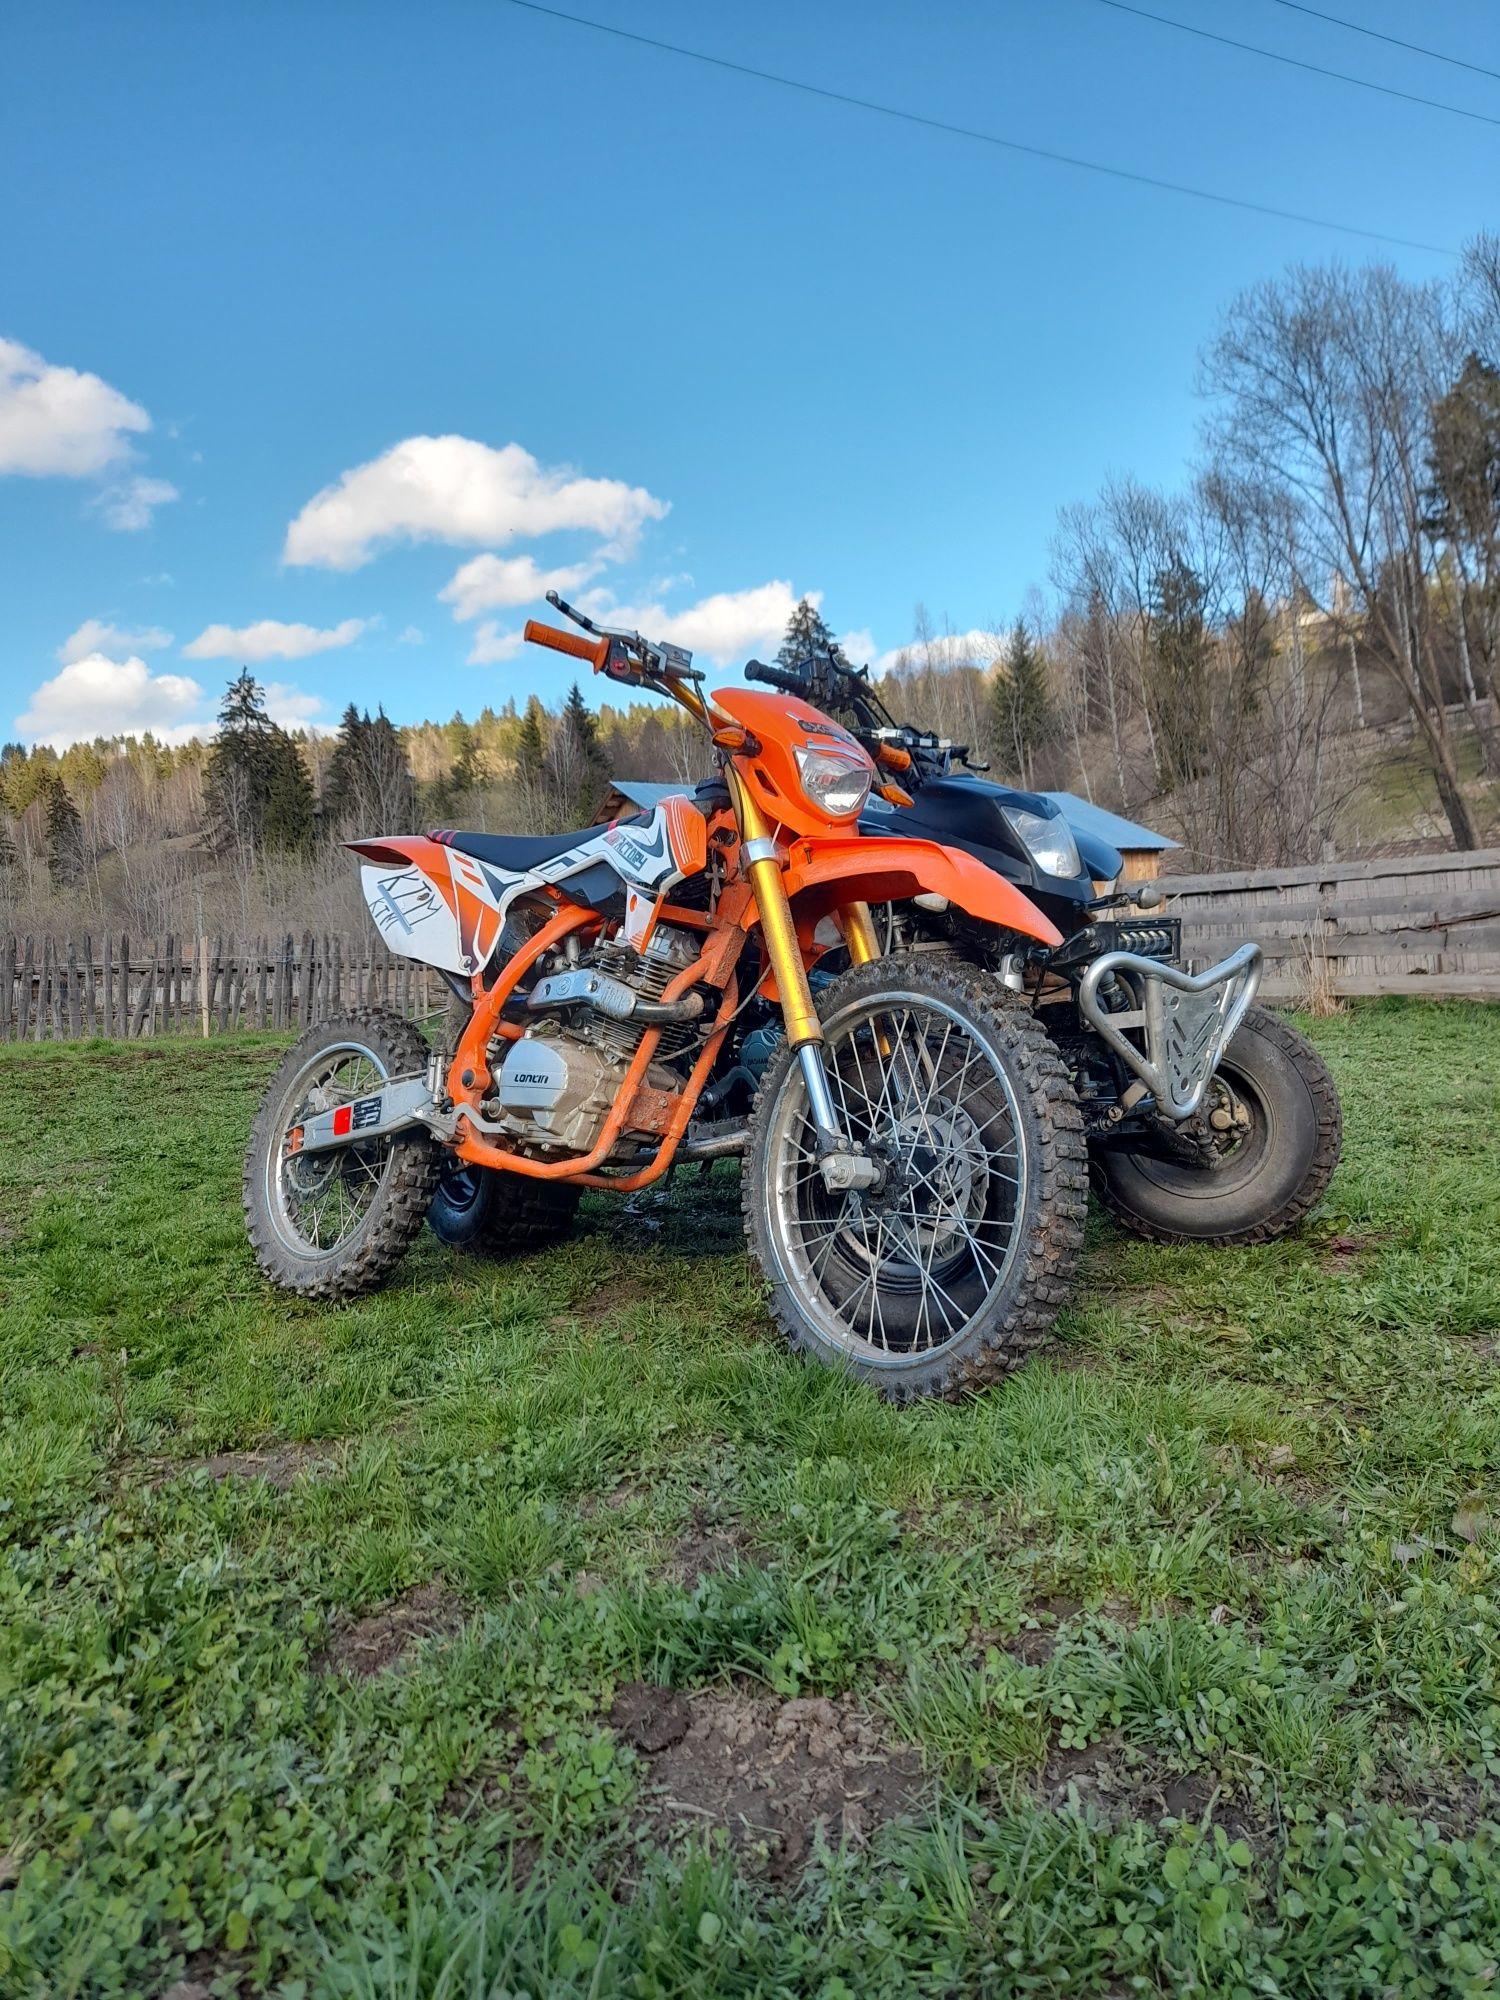 Cross ktm 250cc cu motor loncin nou (gas gas ,yamaha ,kawasaki,ktm ,)